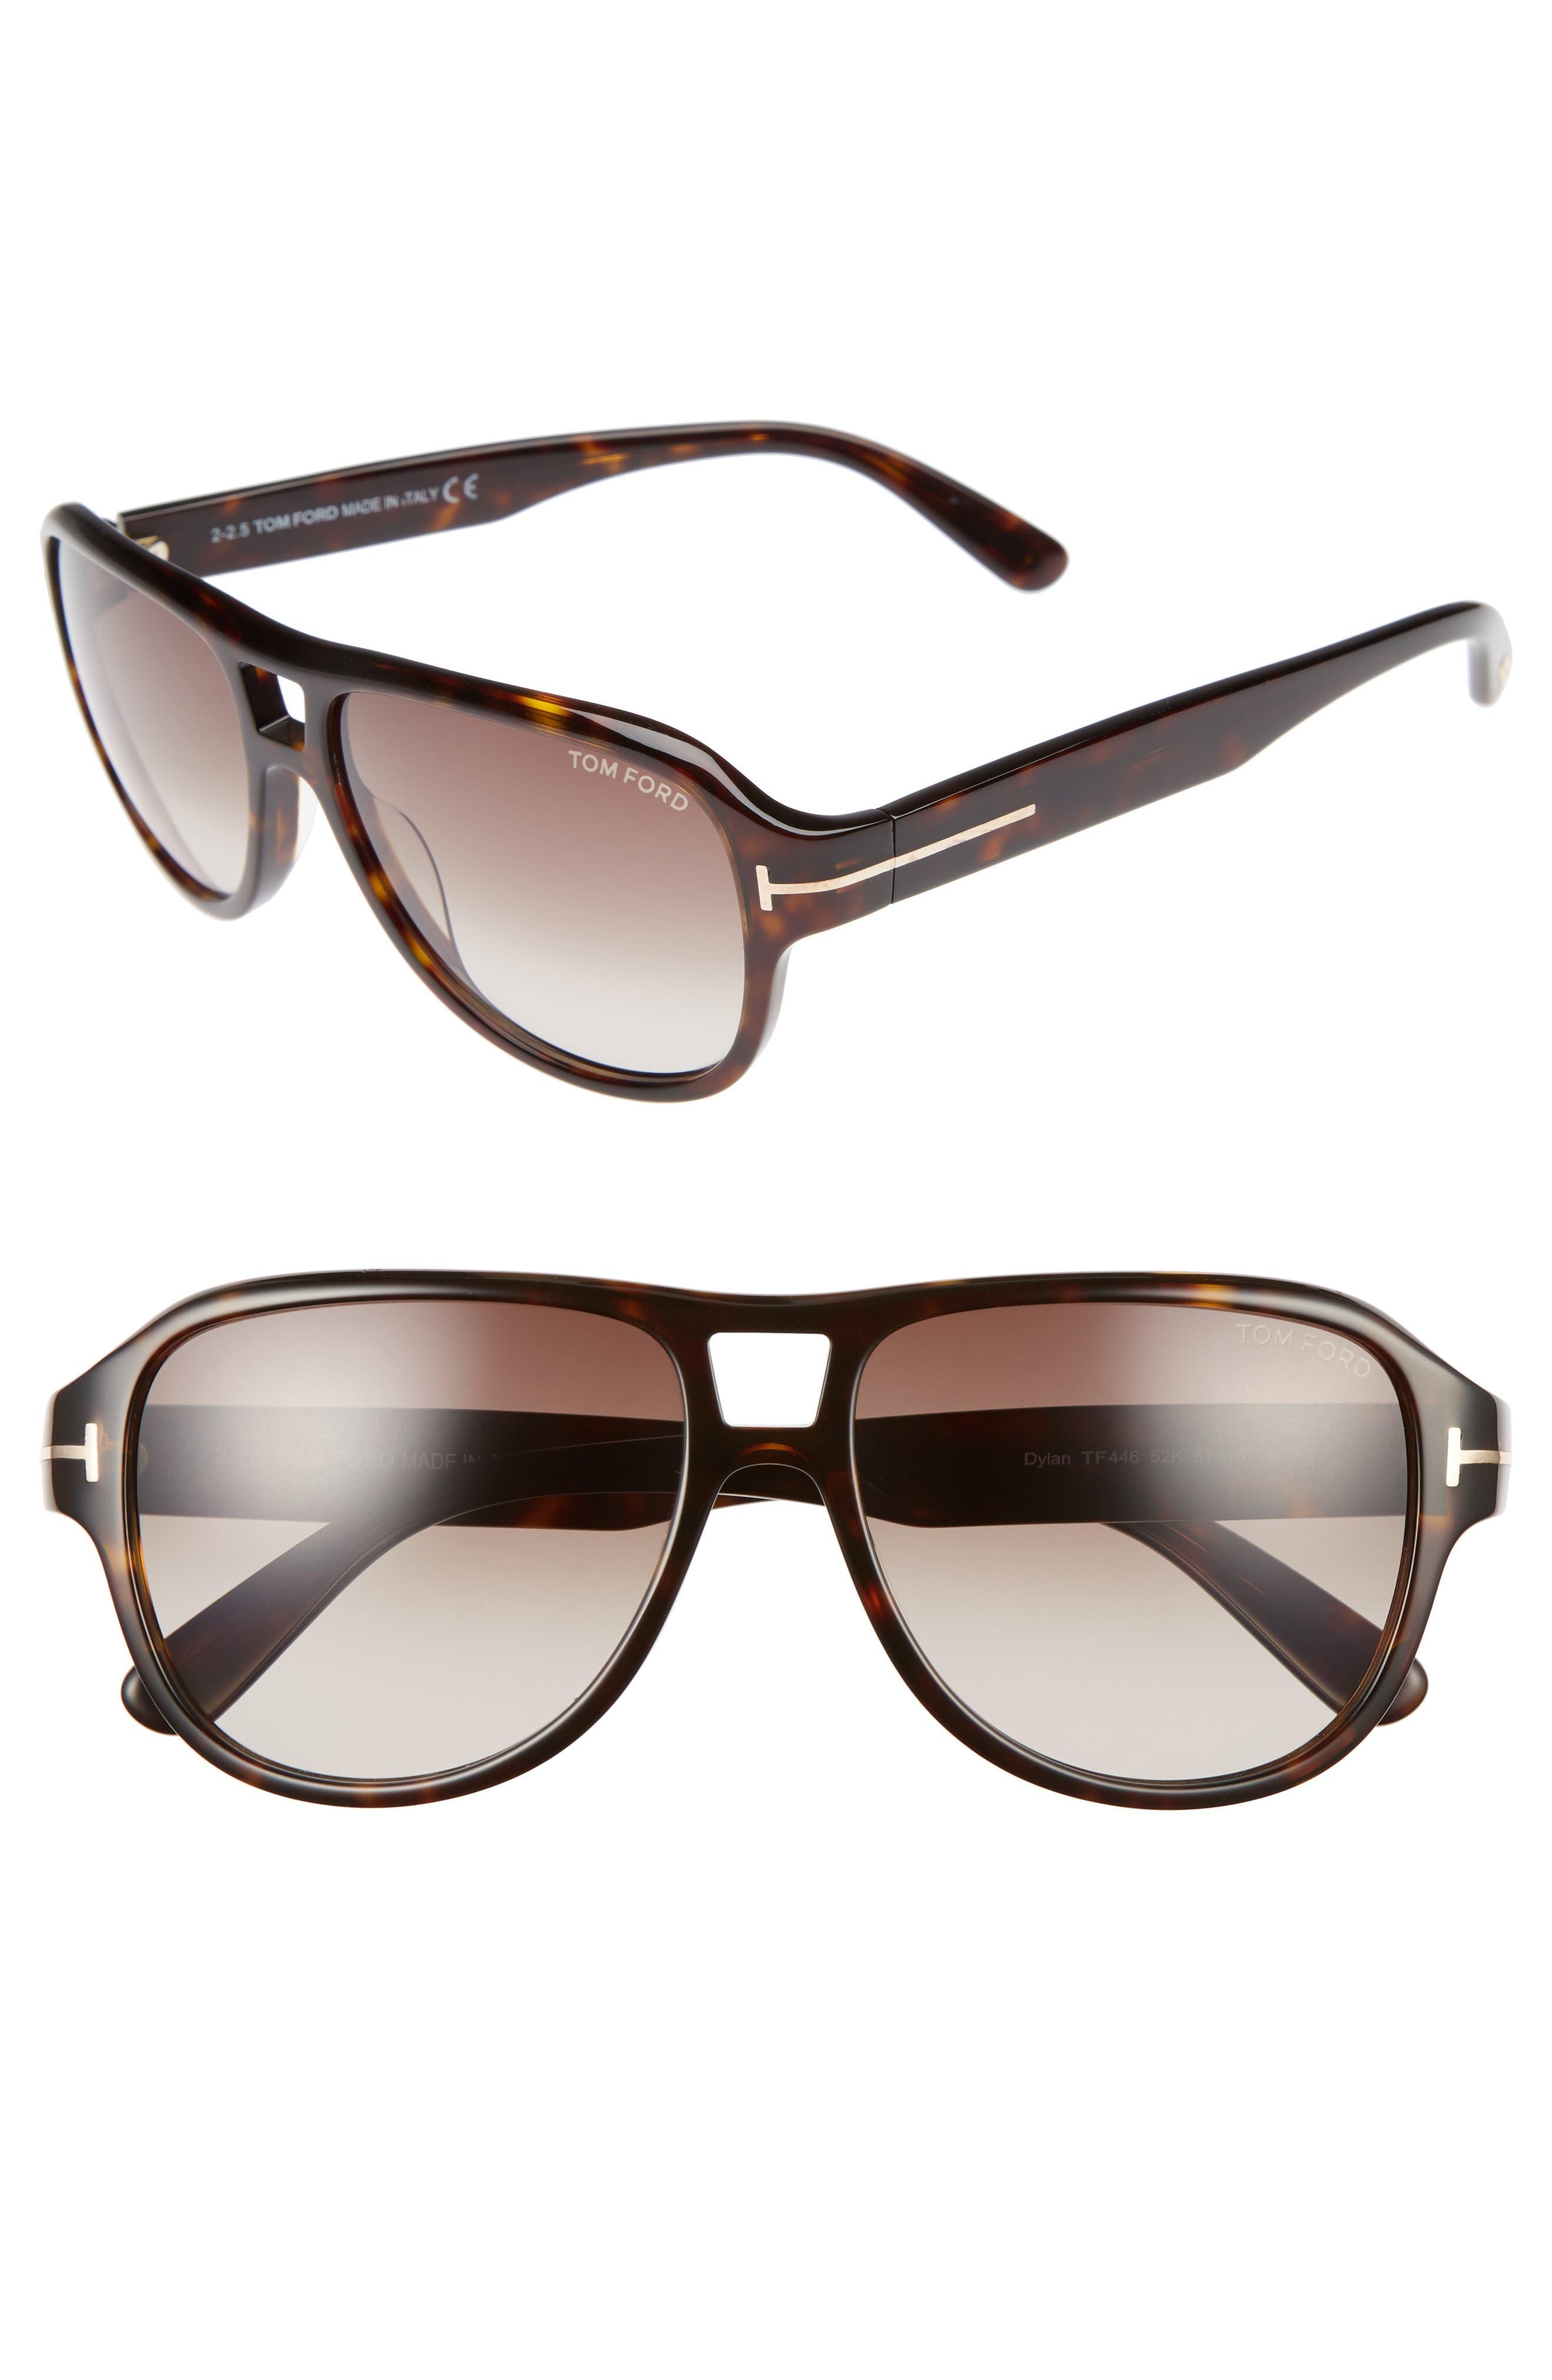 Philippa 55mm Gradient Round Aviator Sunglasses,                         Main,                         color, 001